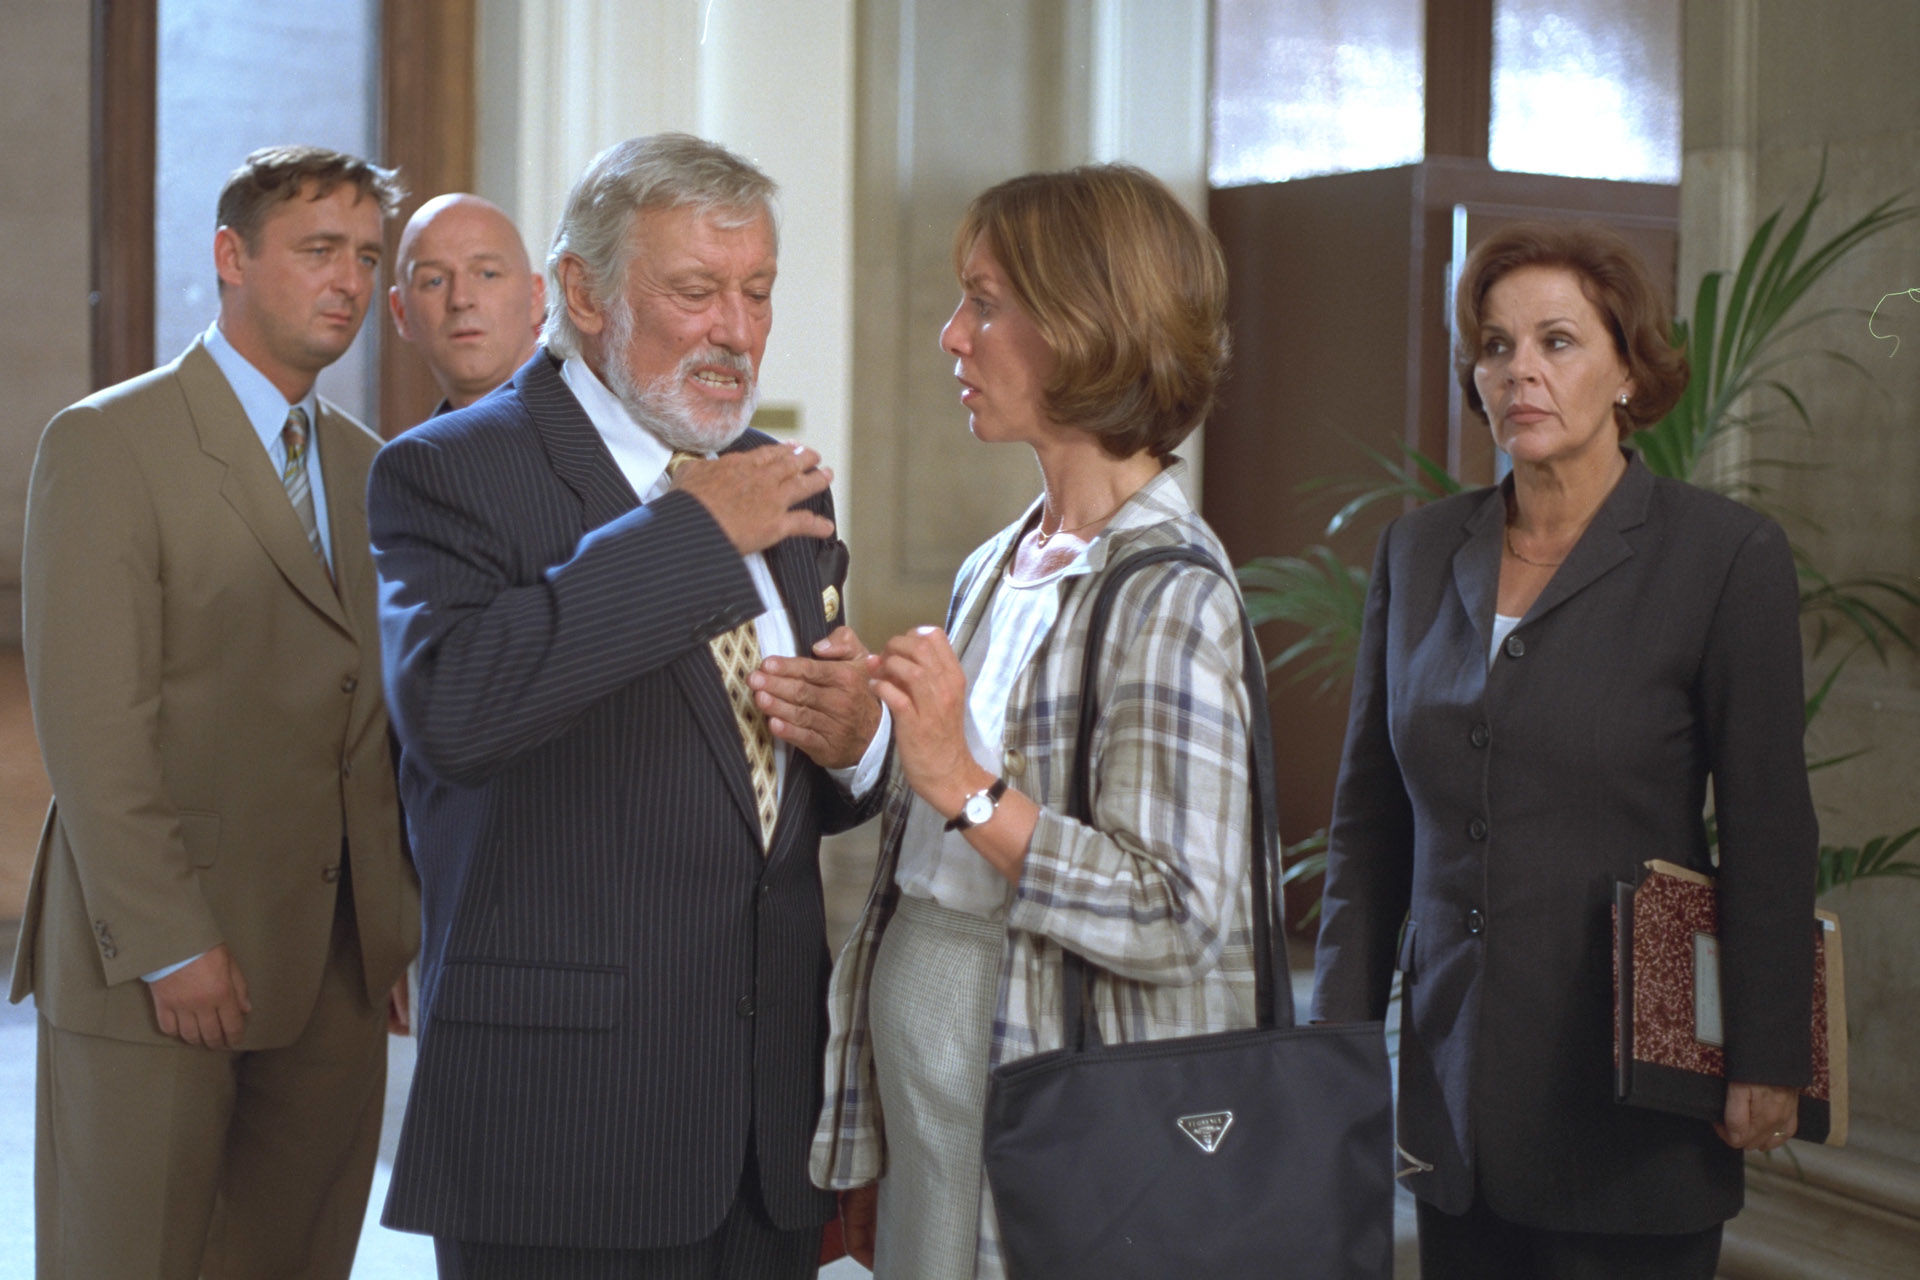 Andreas Vitasek, Alexander Goebel, Dietmar Schönherr (Anwalt), Claudia Kment, Maresa Hörbiger (Richterin)